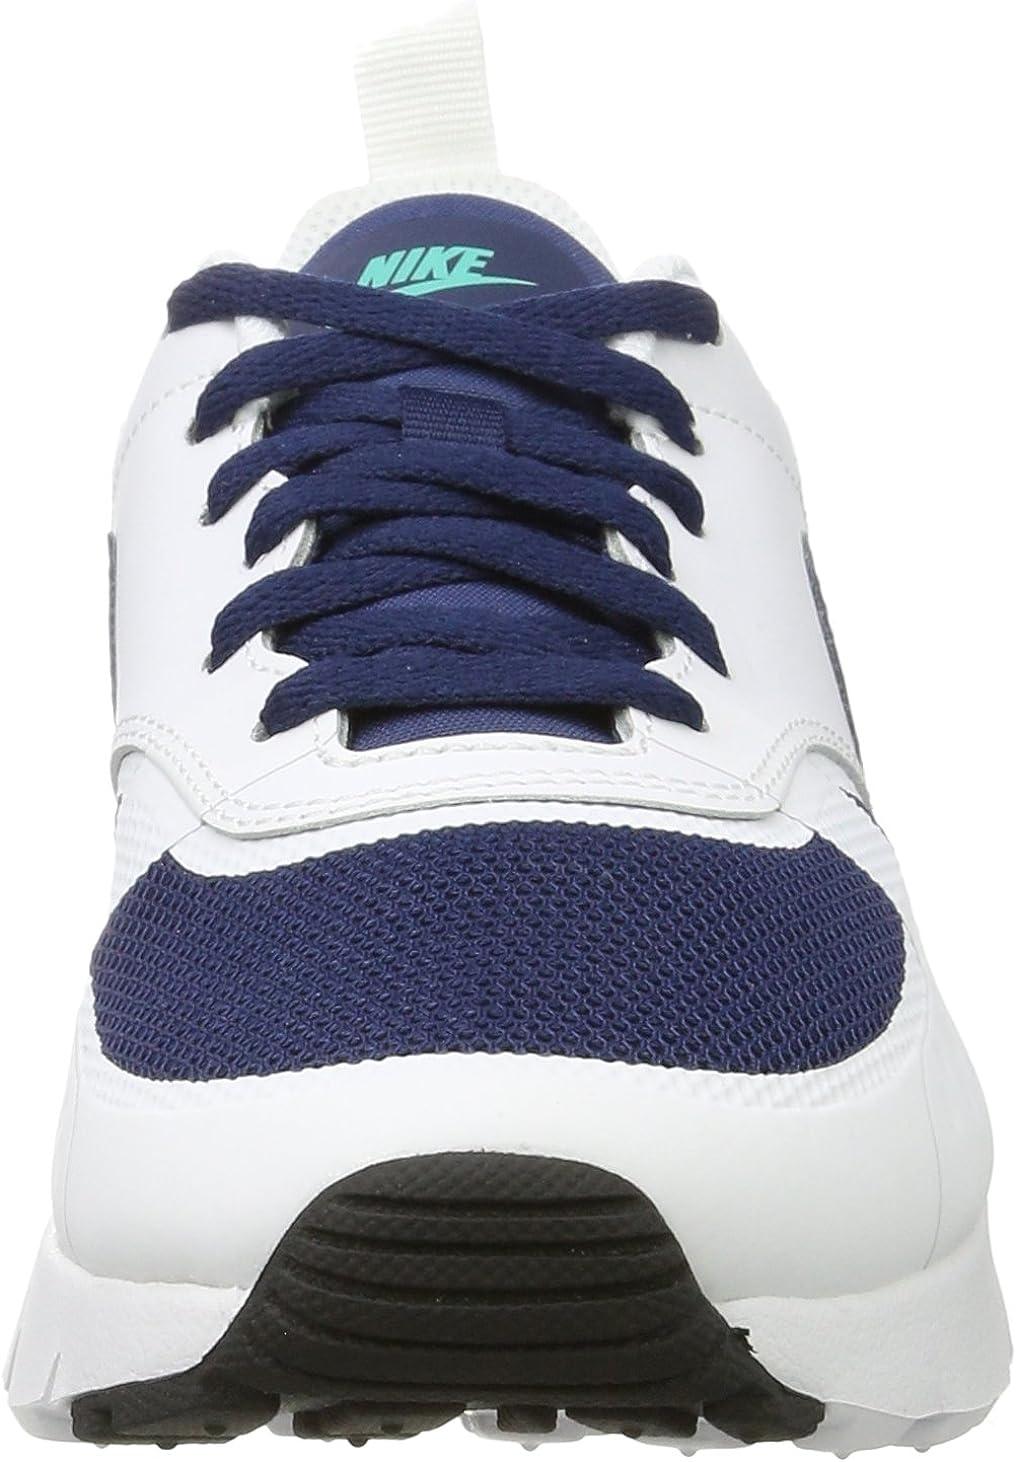 : Nike Air Max Vision (GS) 917857 400 Youth 5.5